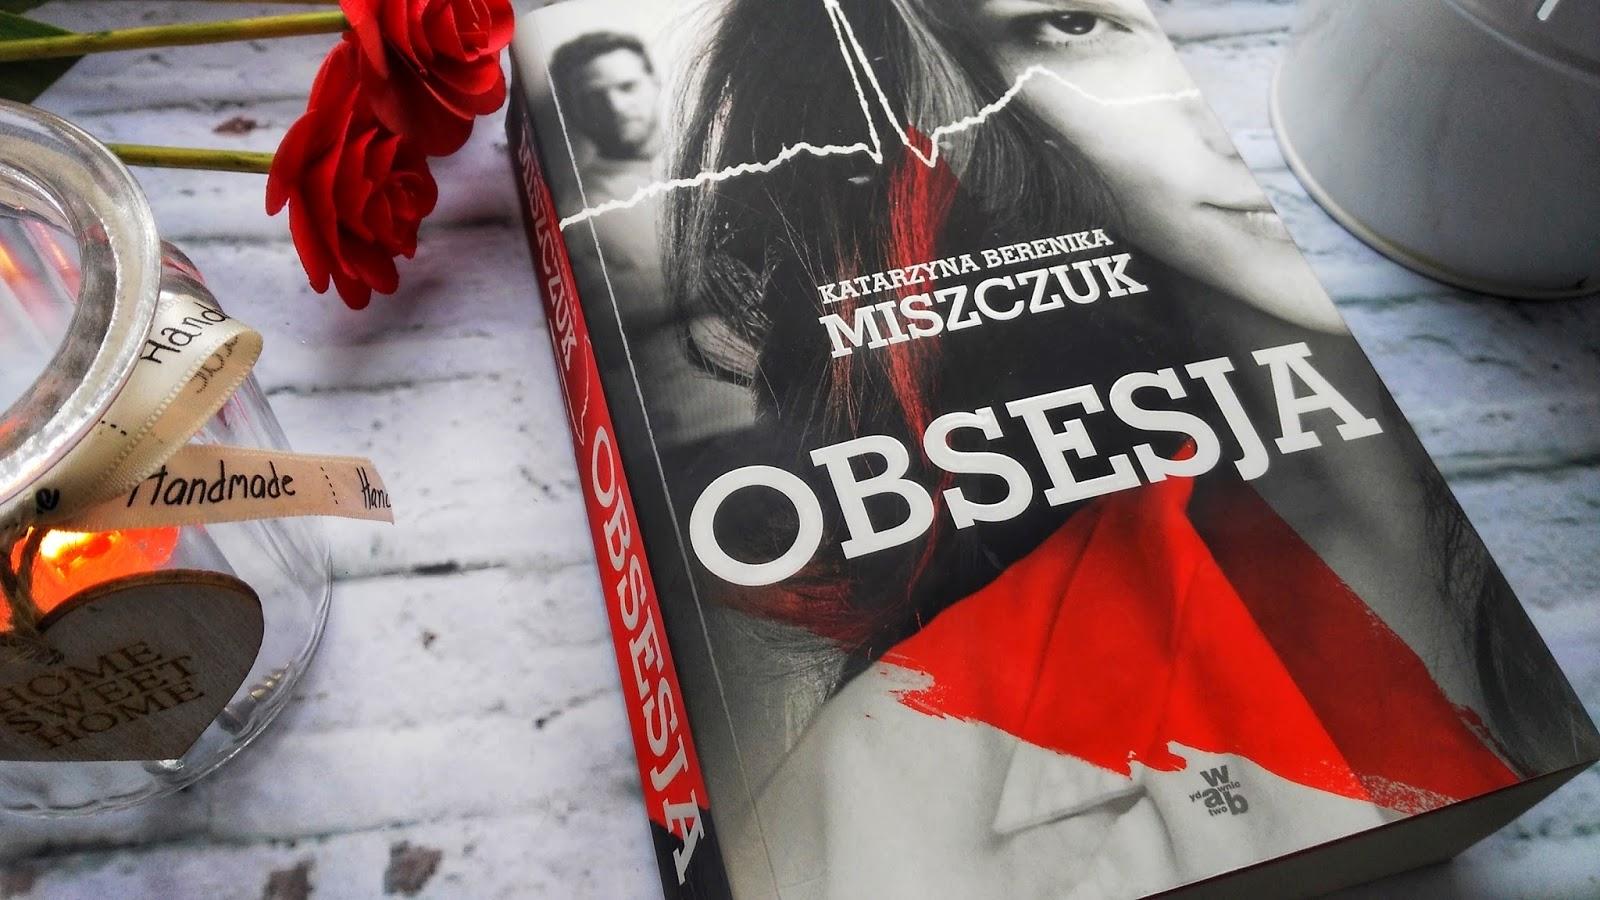 Obsesja - Katarzyna Berenika Miszczuk - recenzja